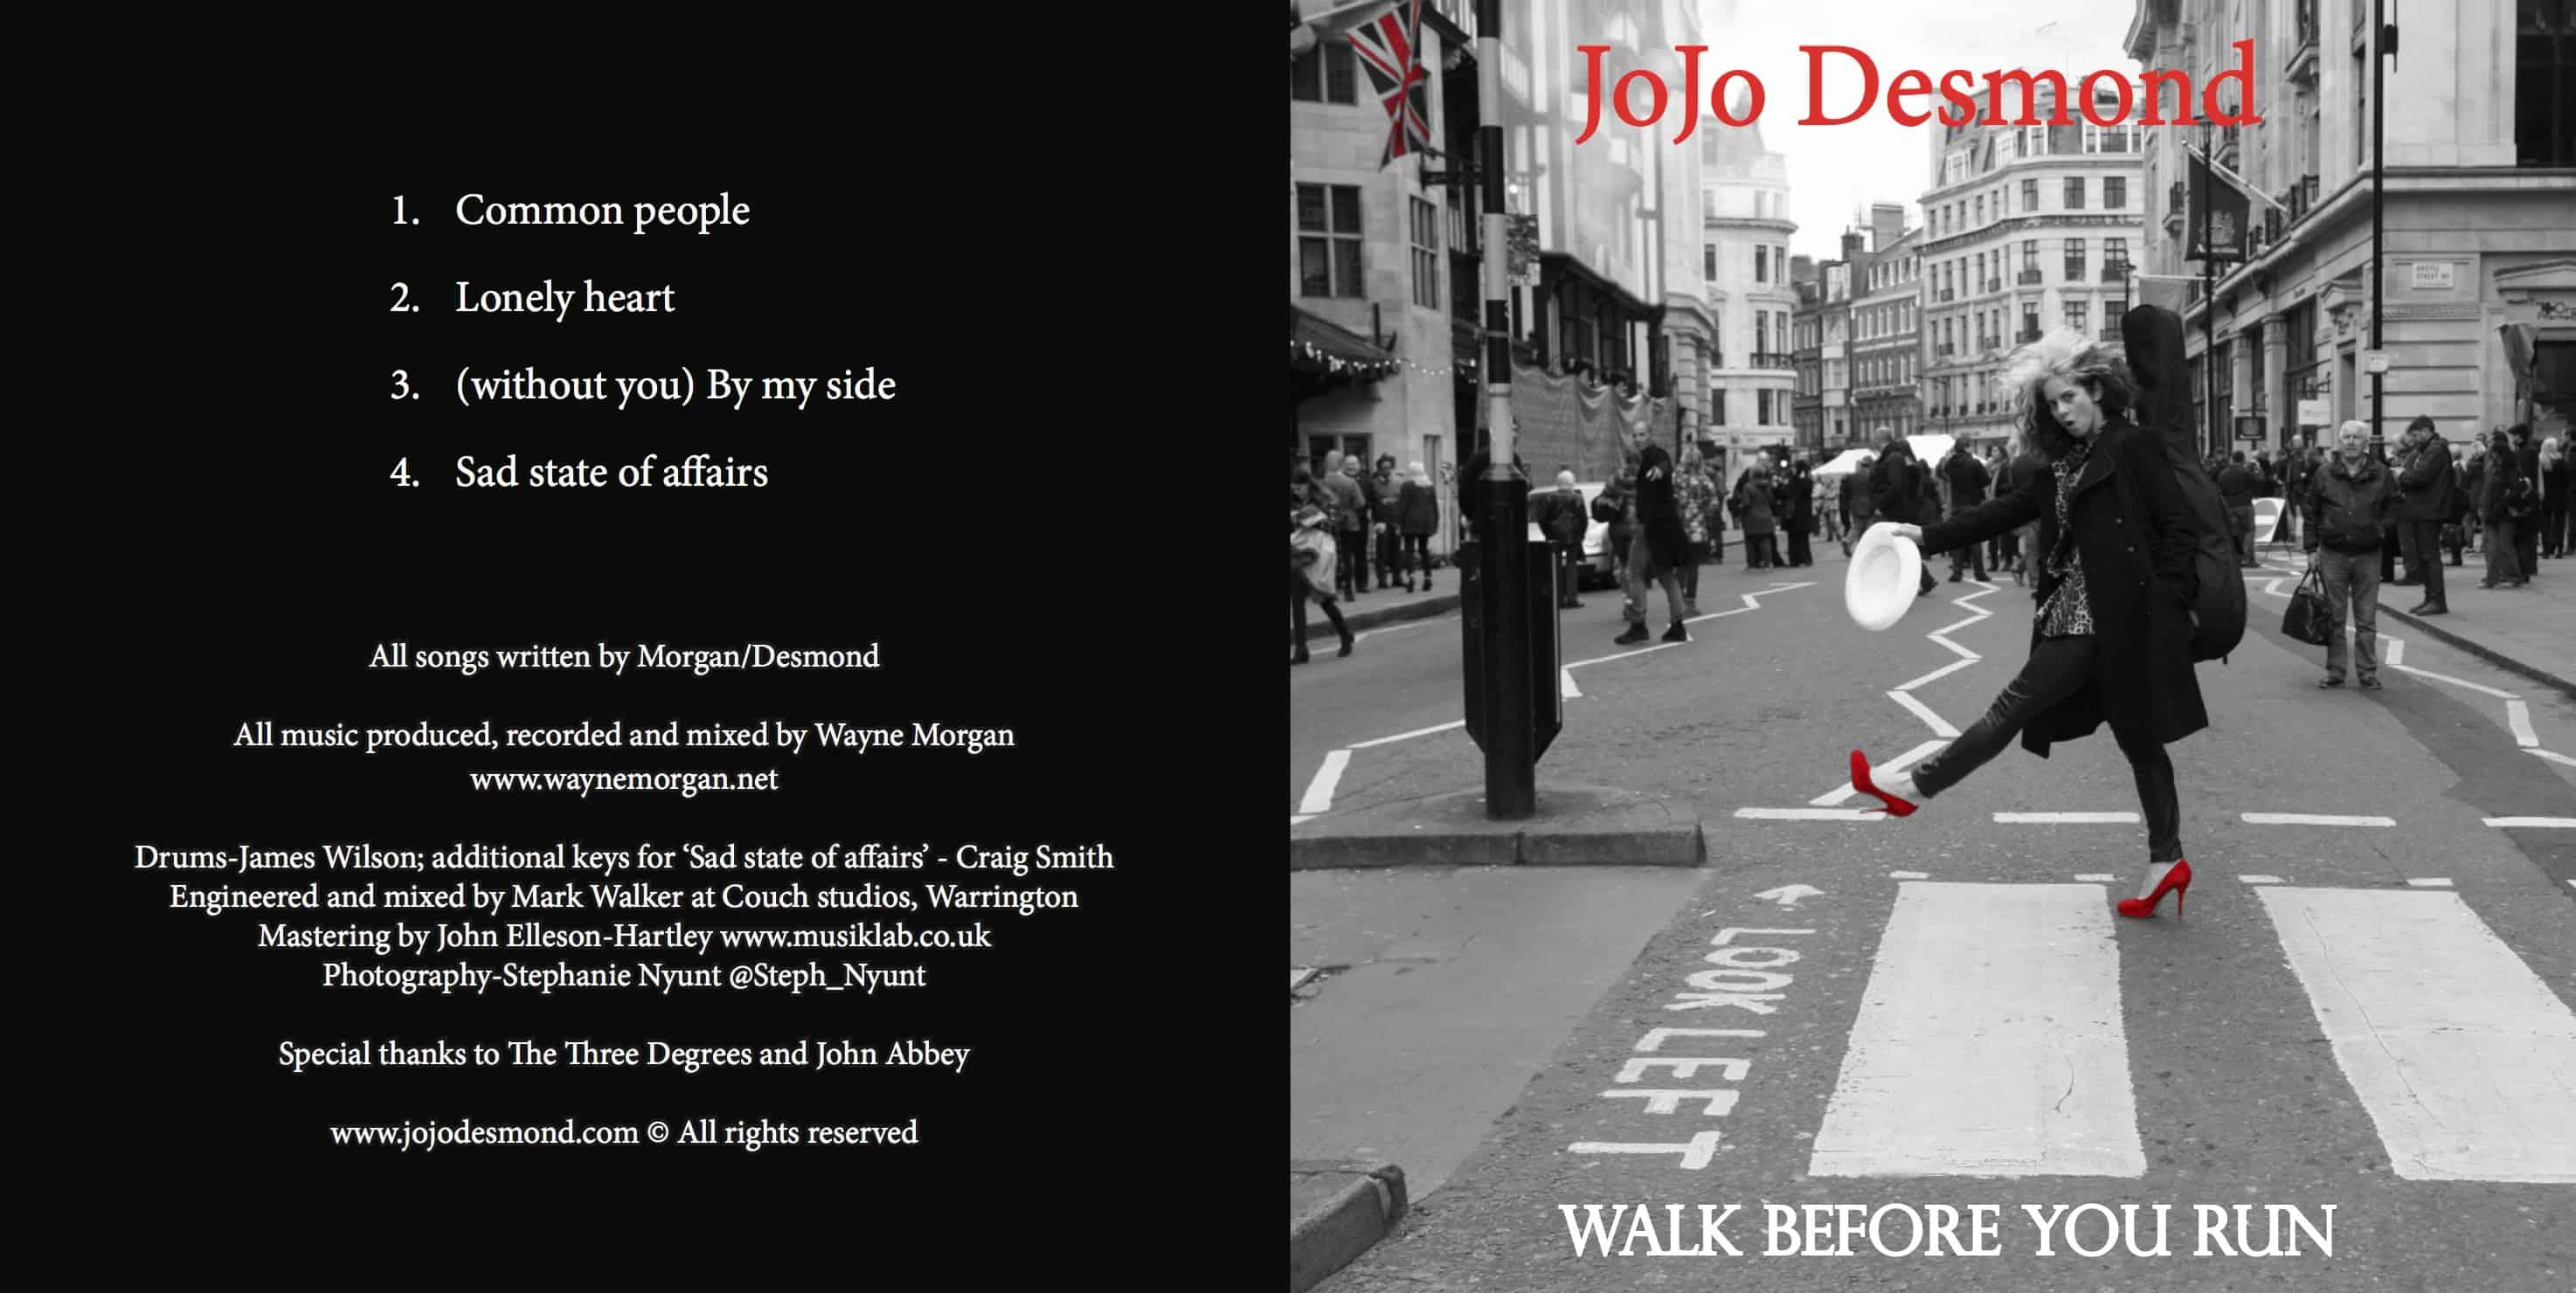 JoJo Desmond | Walk Before You Run